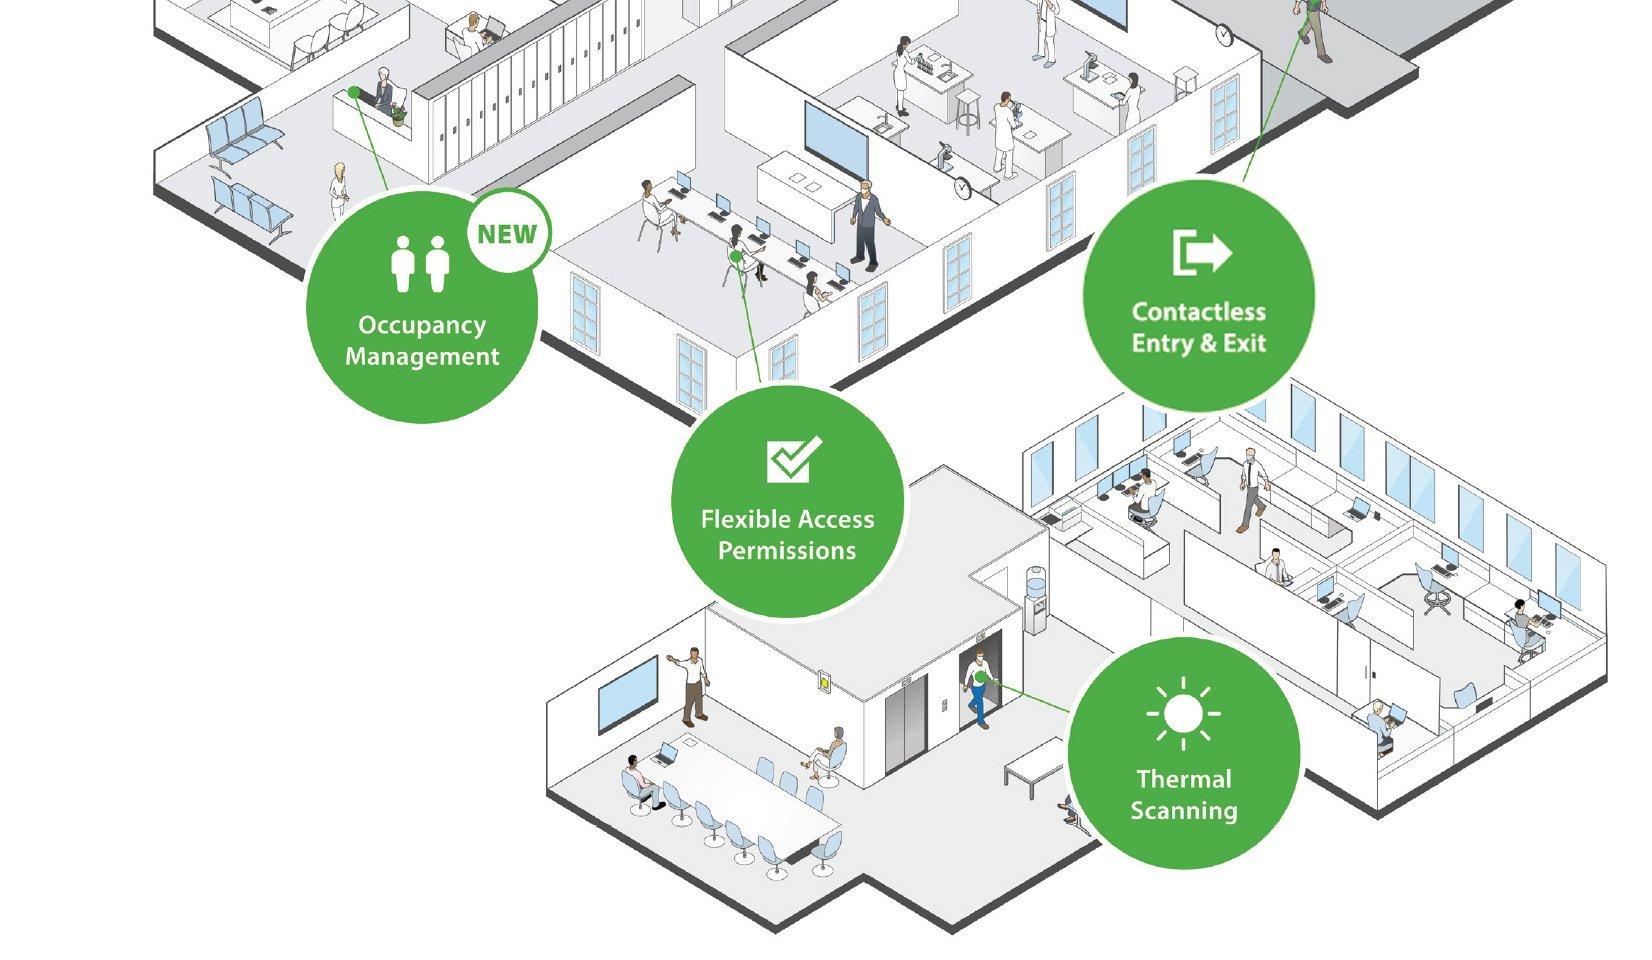 Access control occupancy management